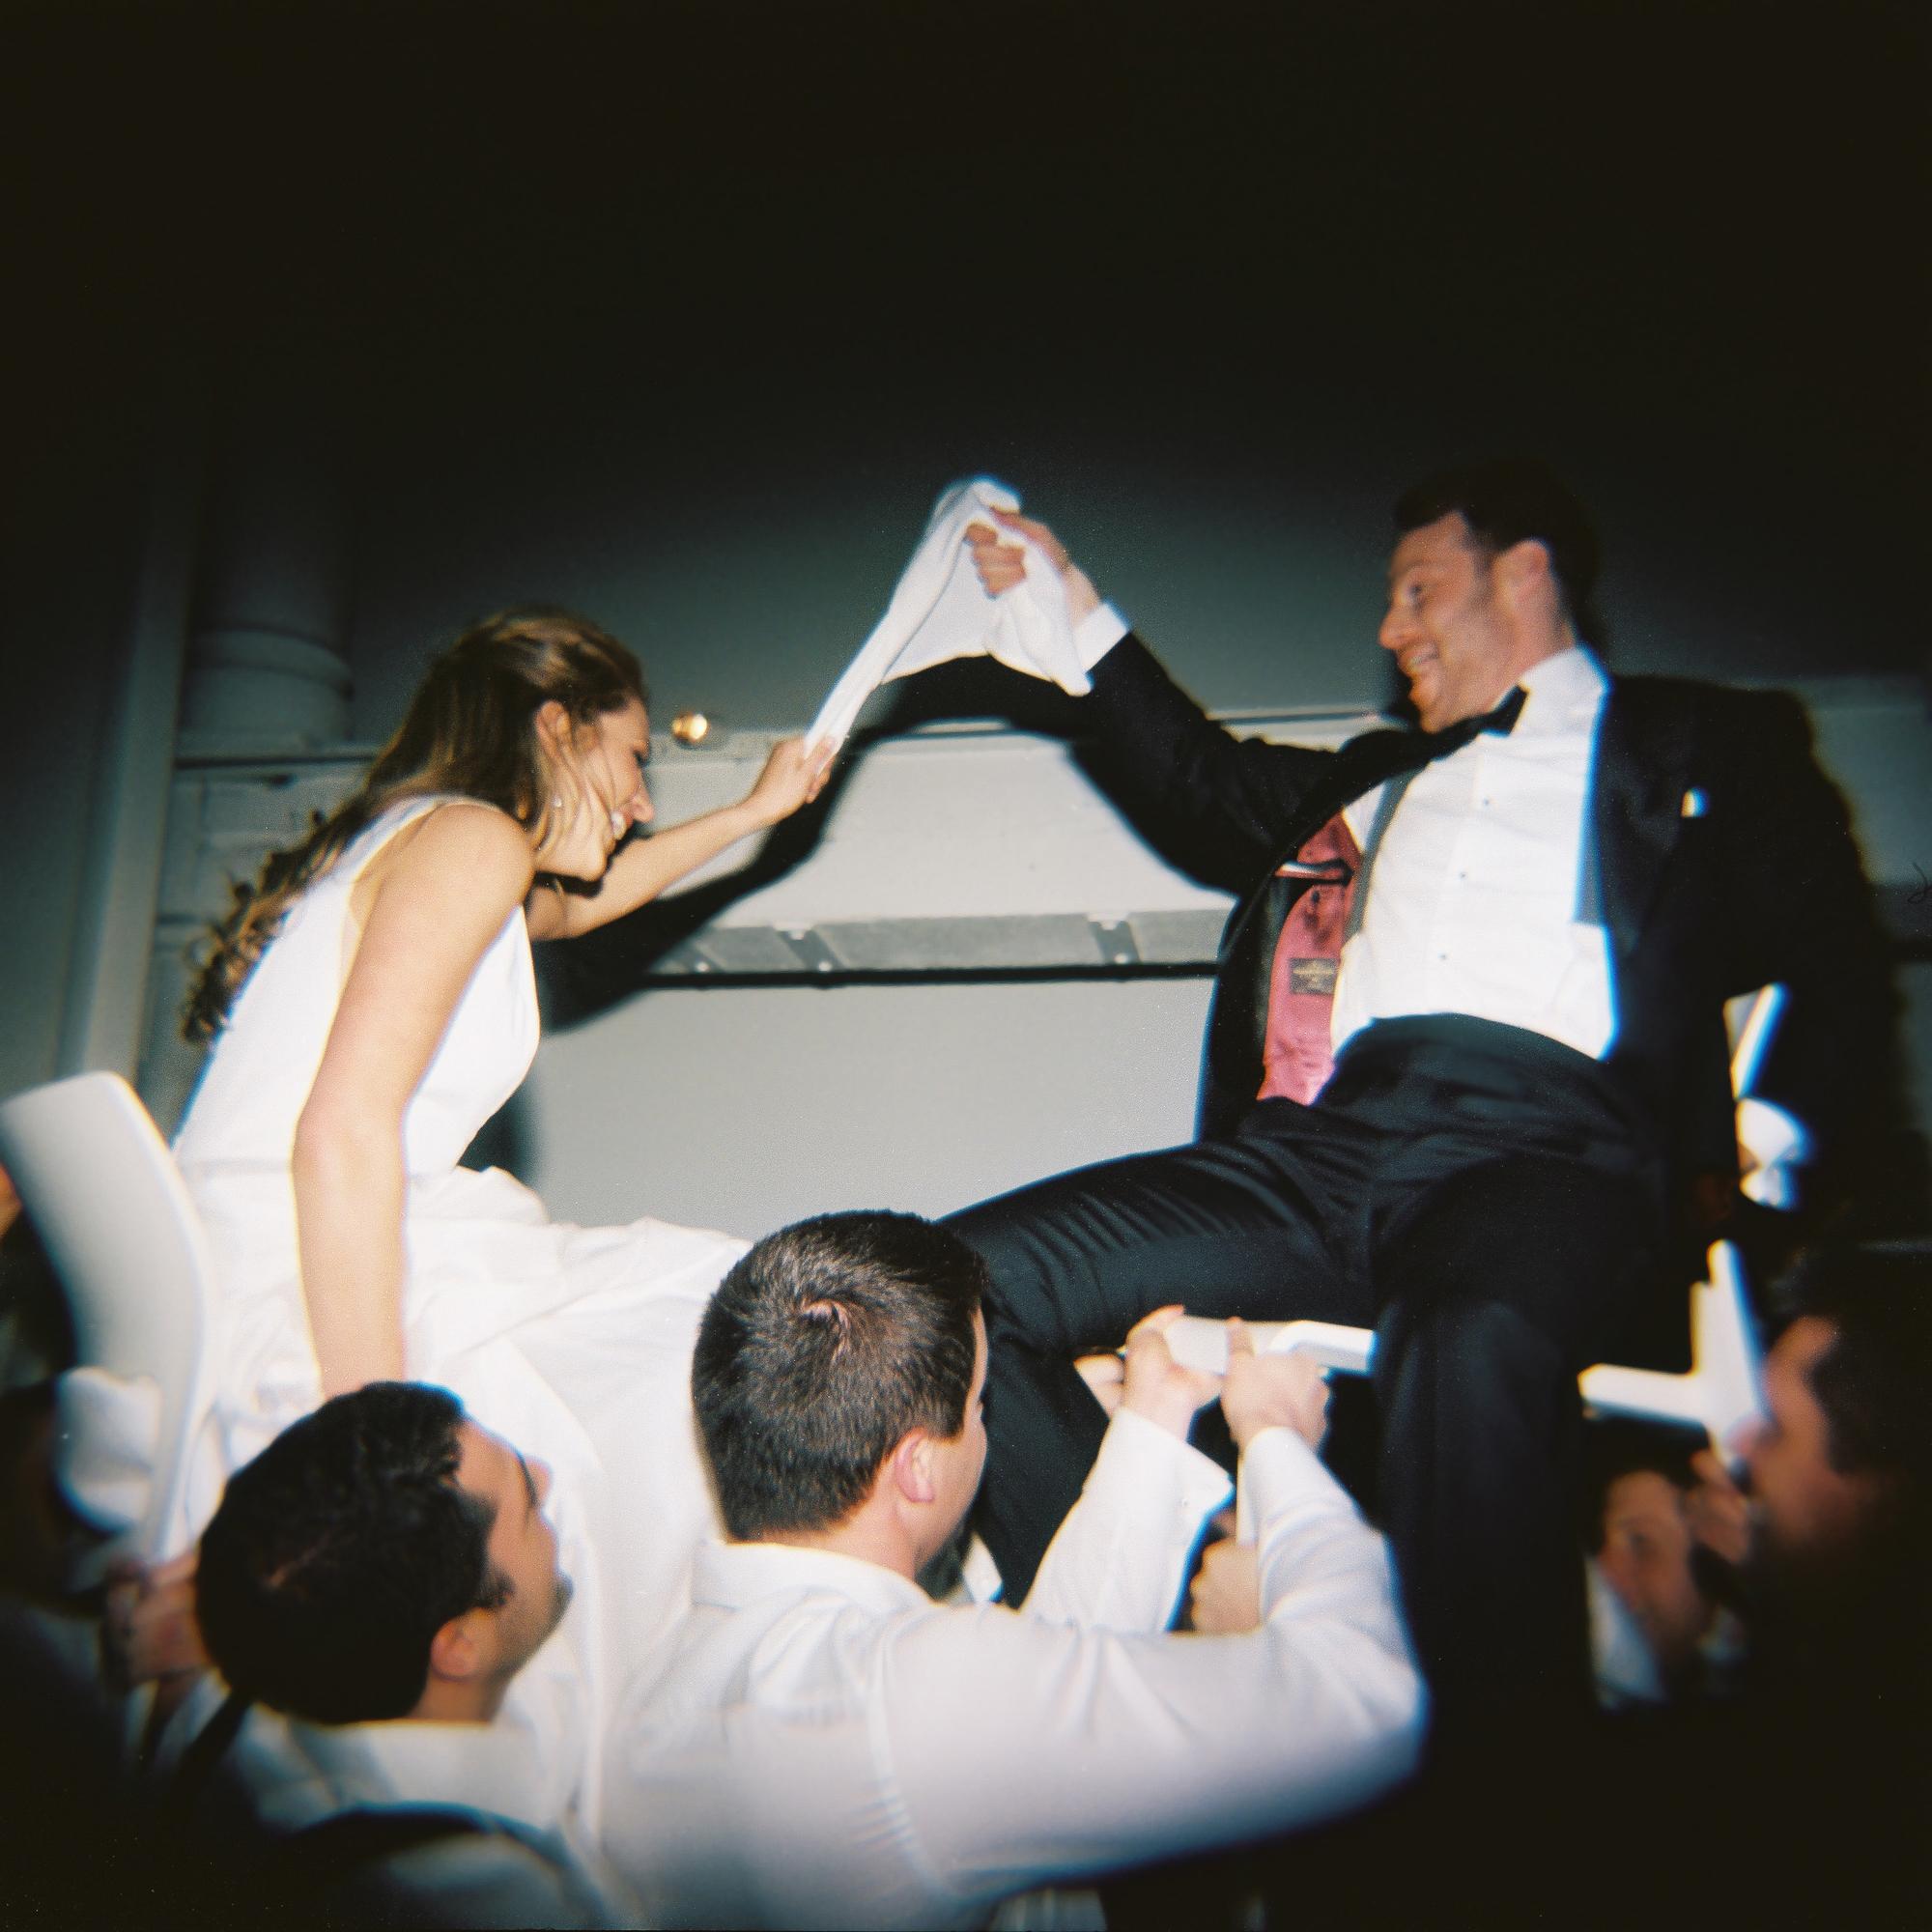 Nashville Wedding 21c Hotel and Museum-020.jpg